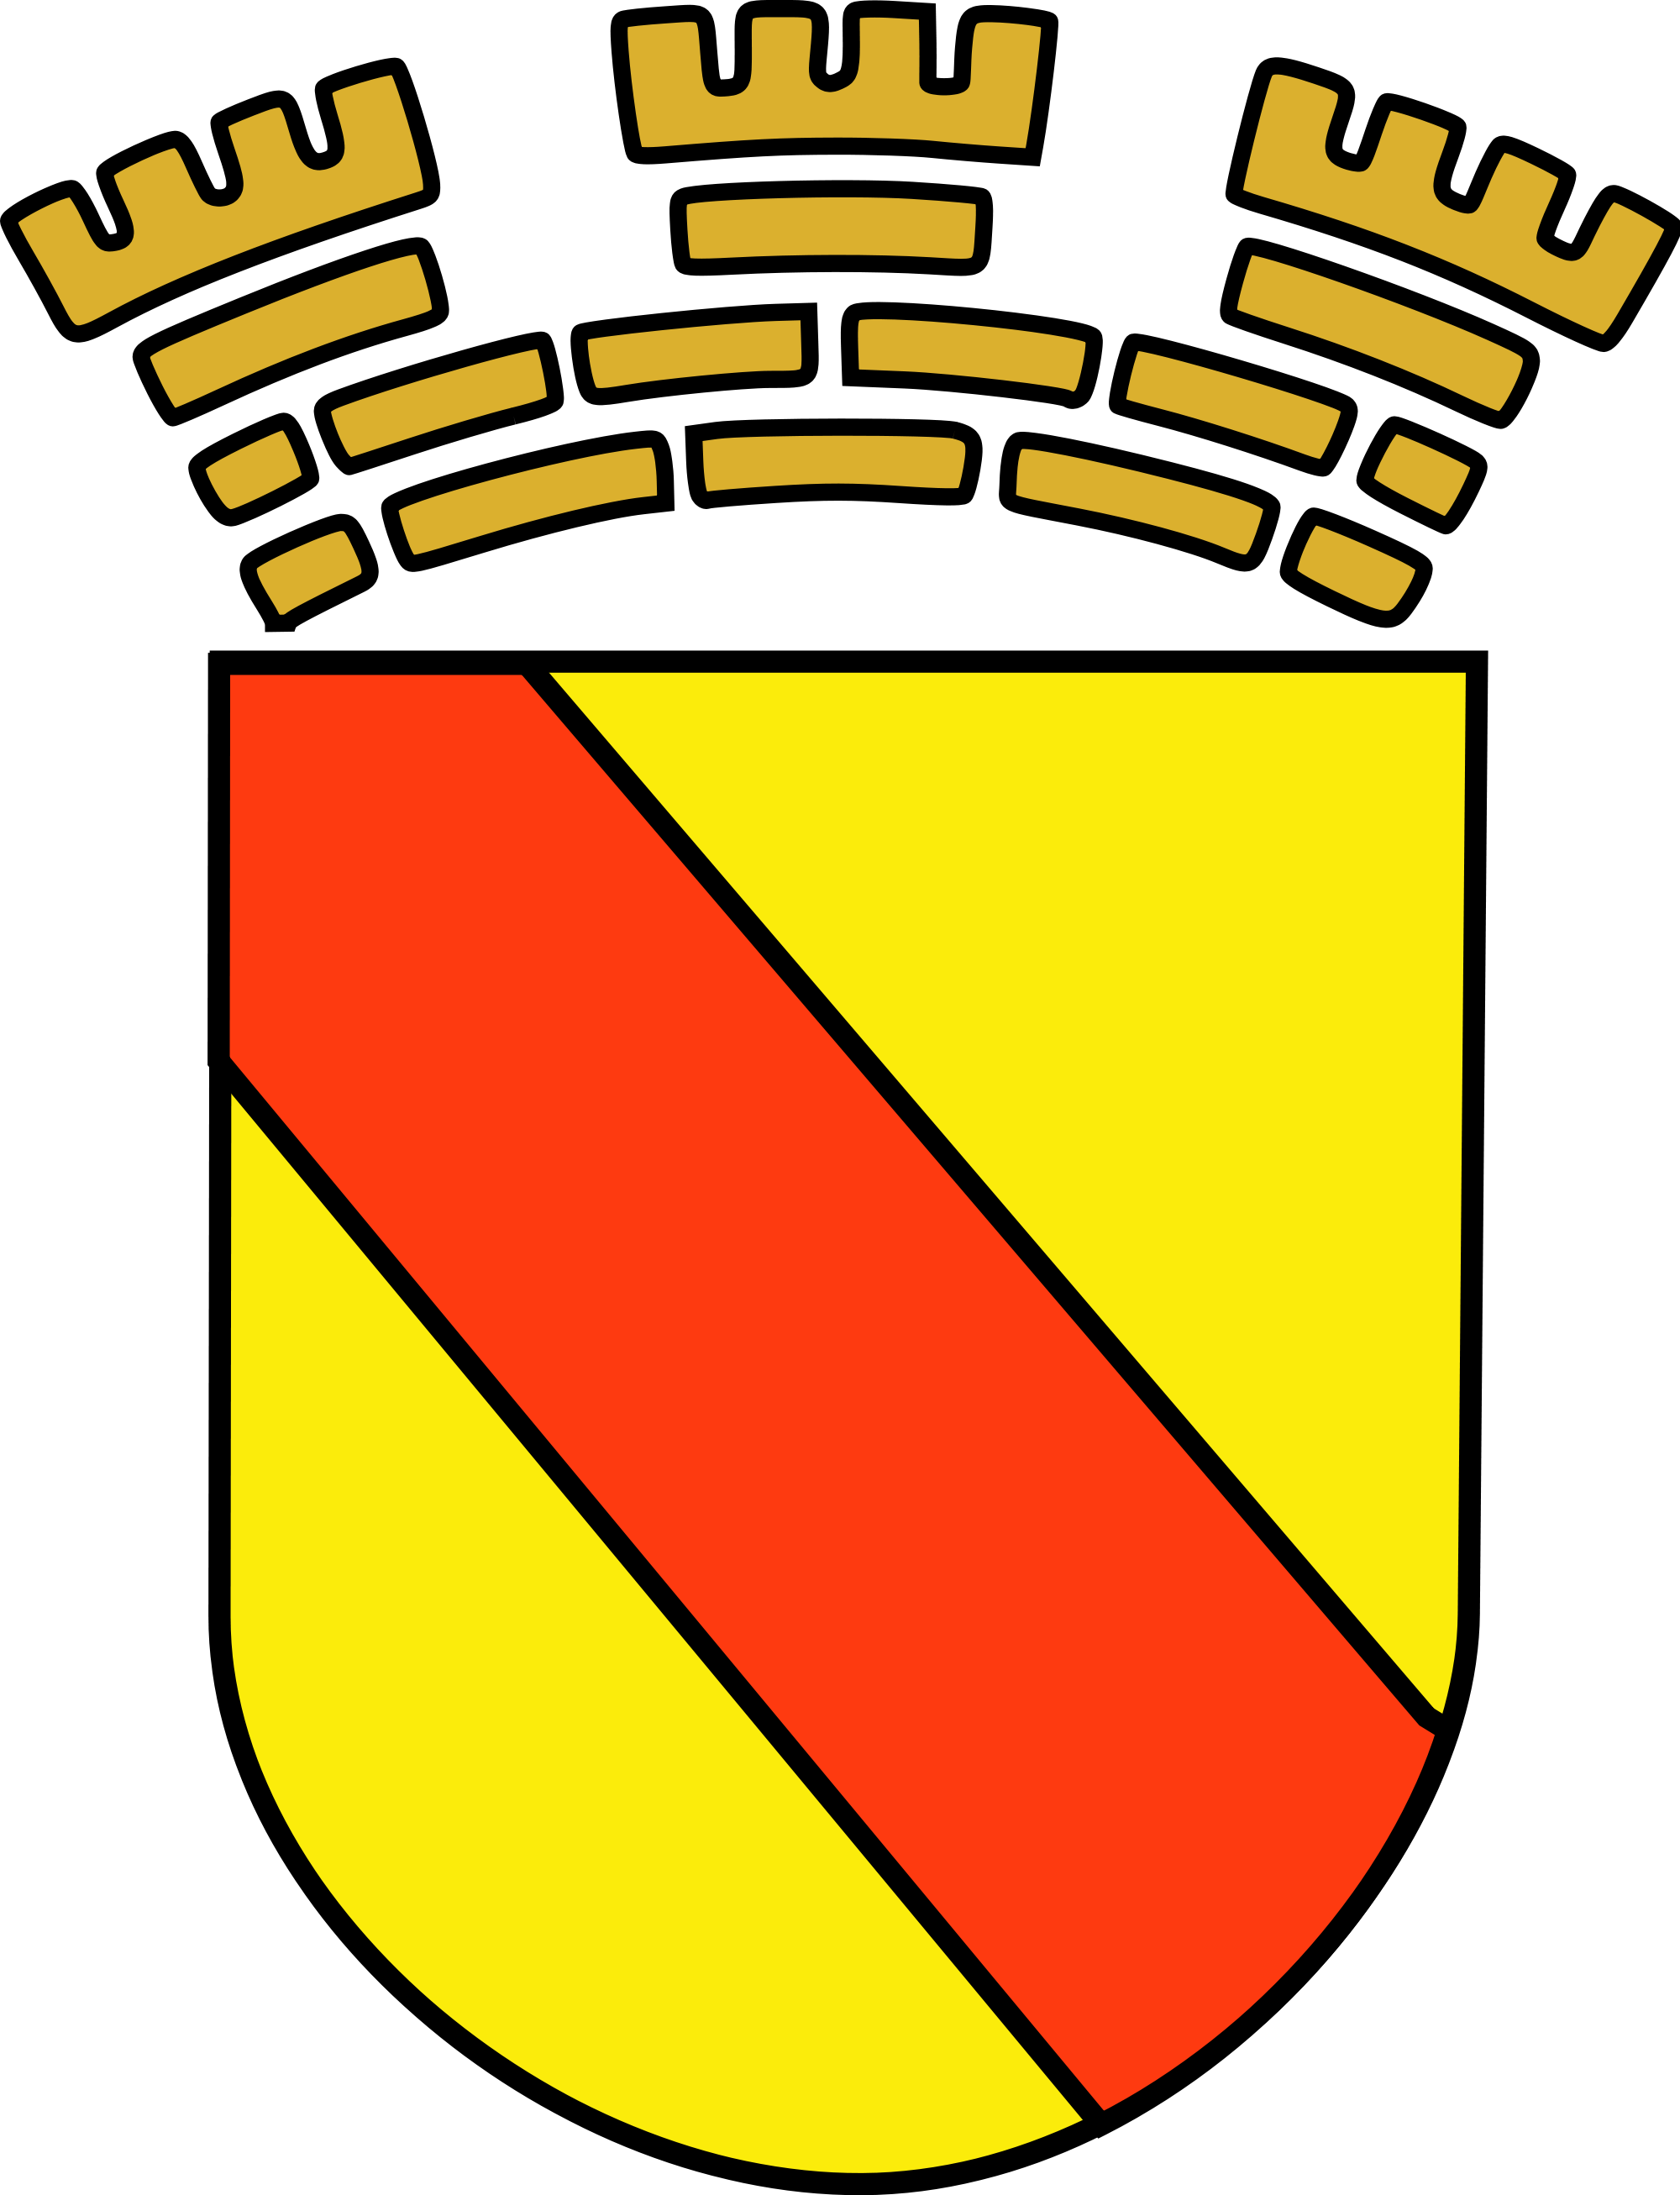 File:Stadtwappen der Stadt Baden.